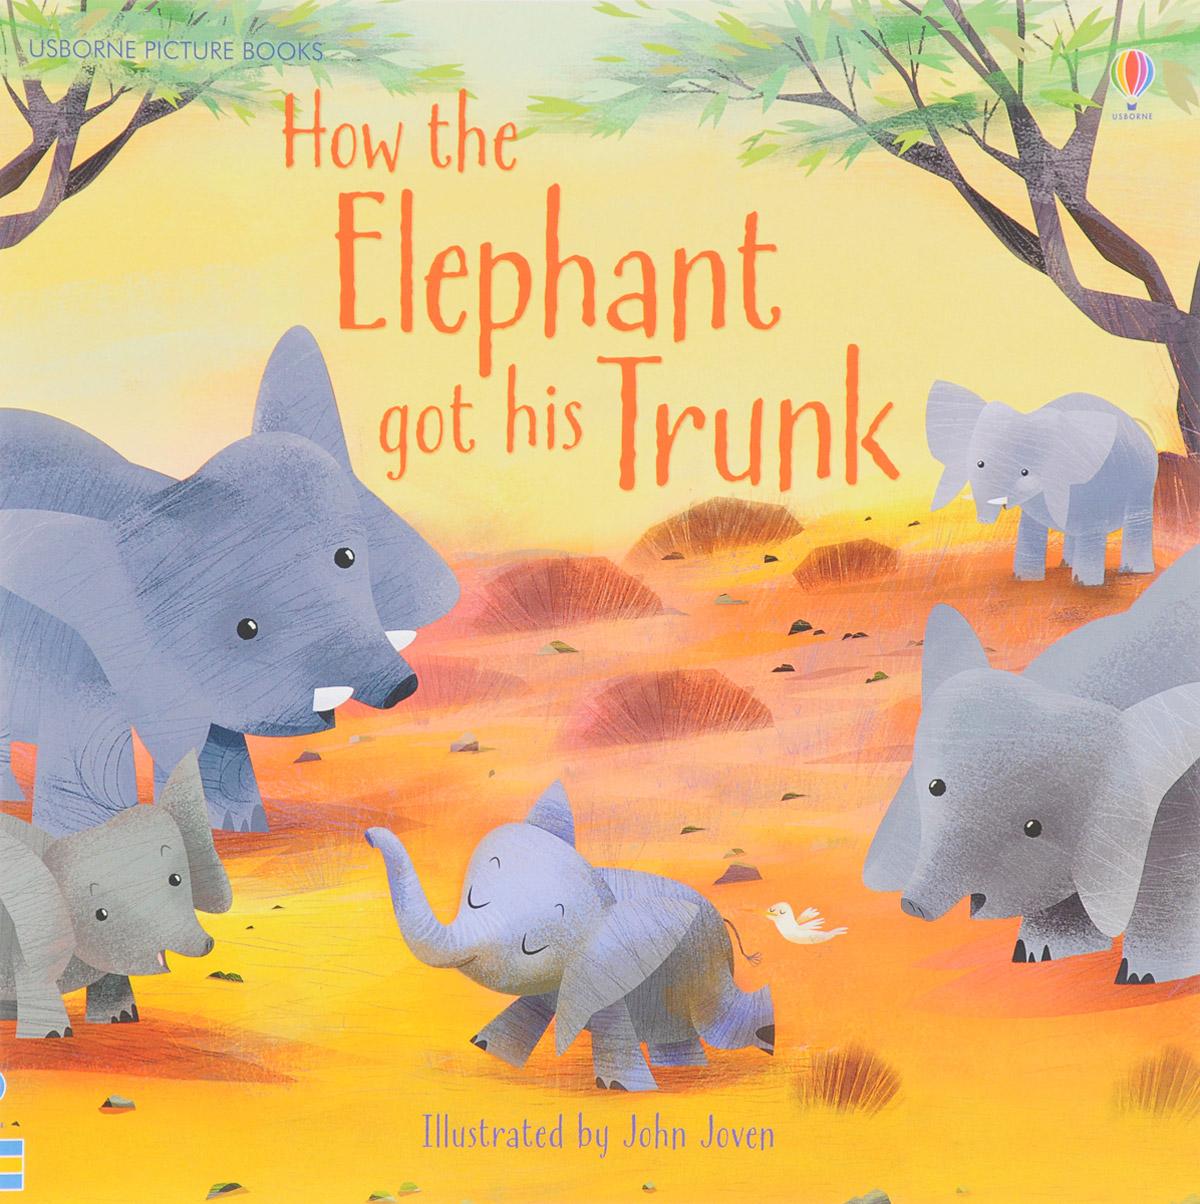 купить How the elephant got his trunk дешево